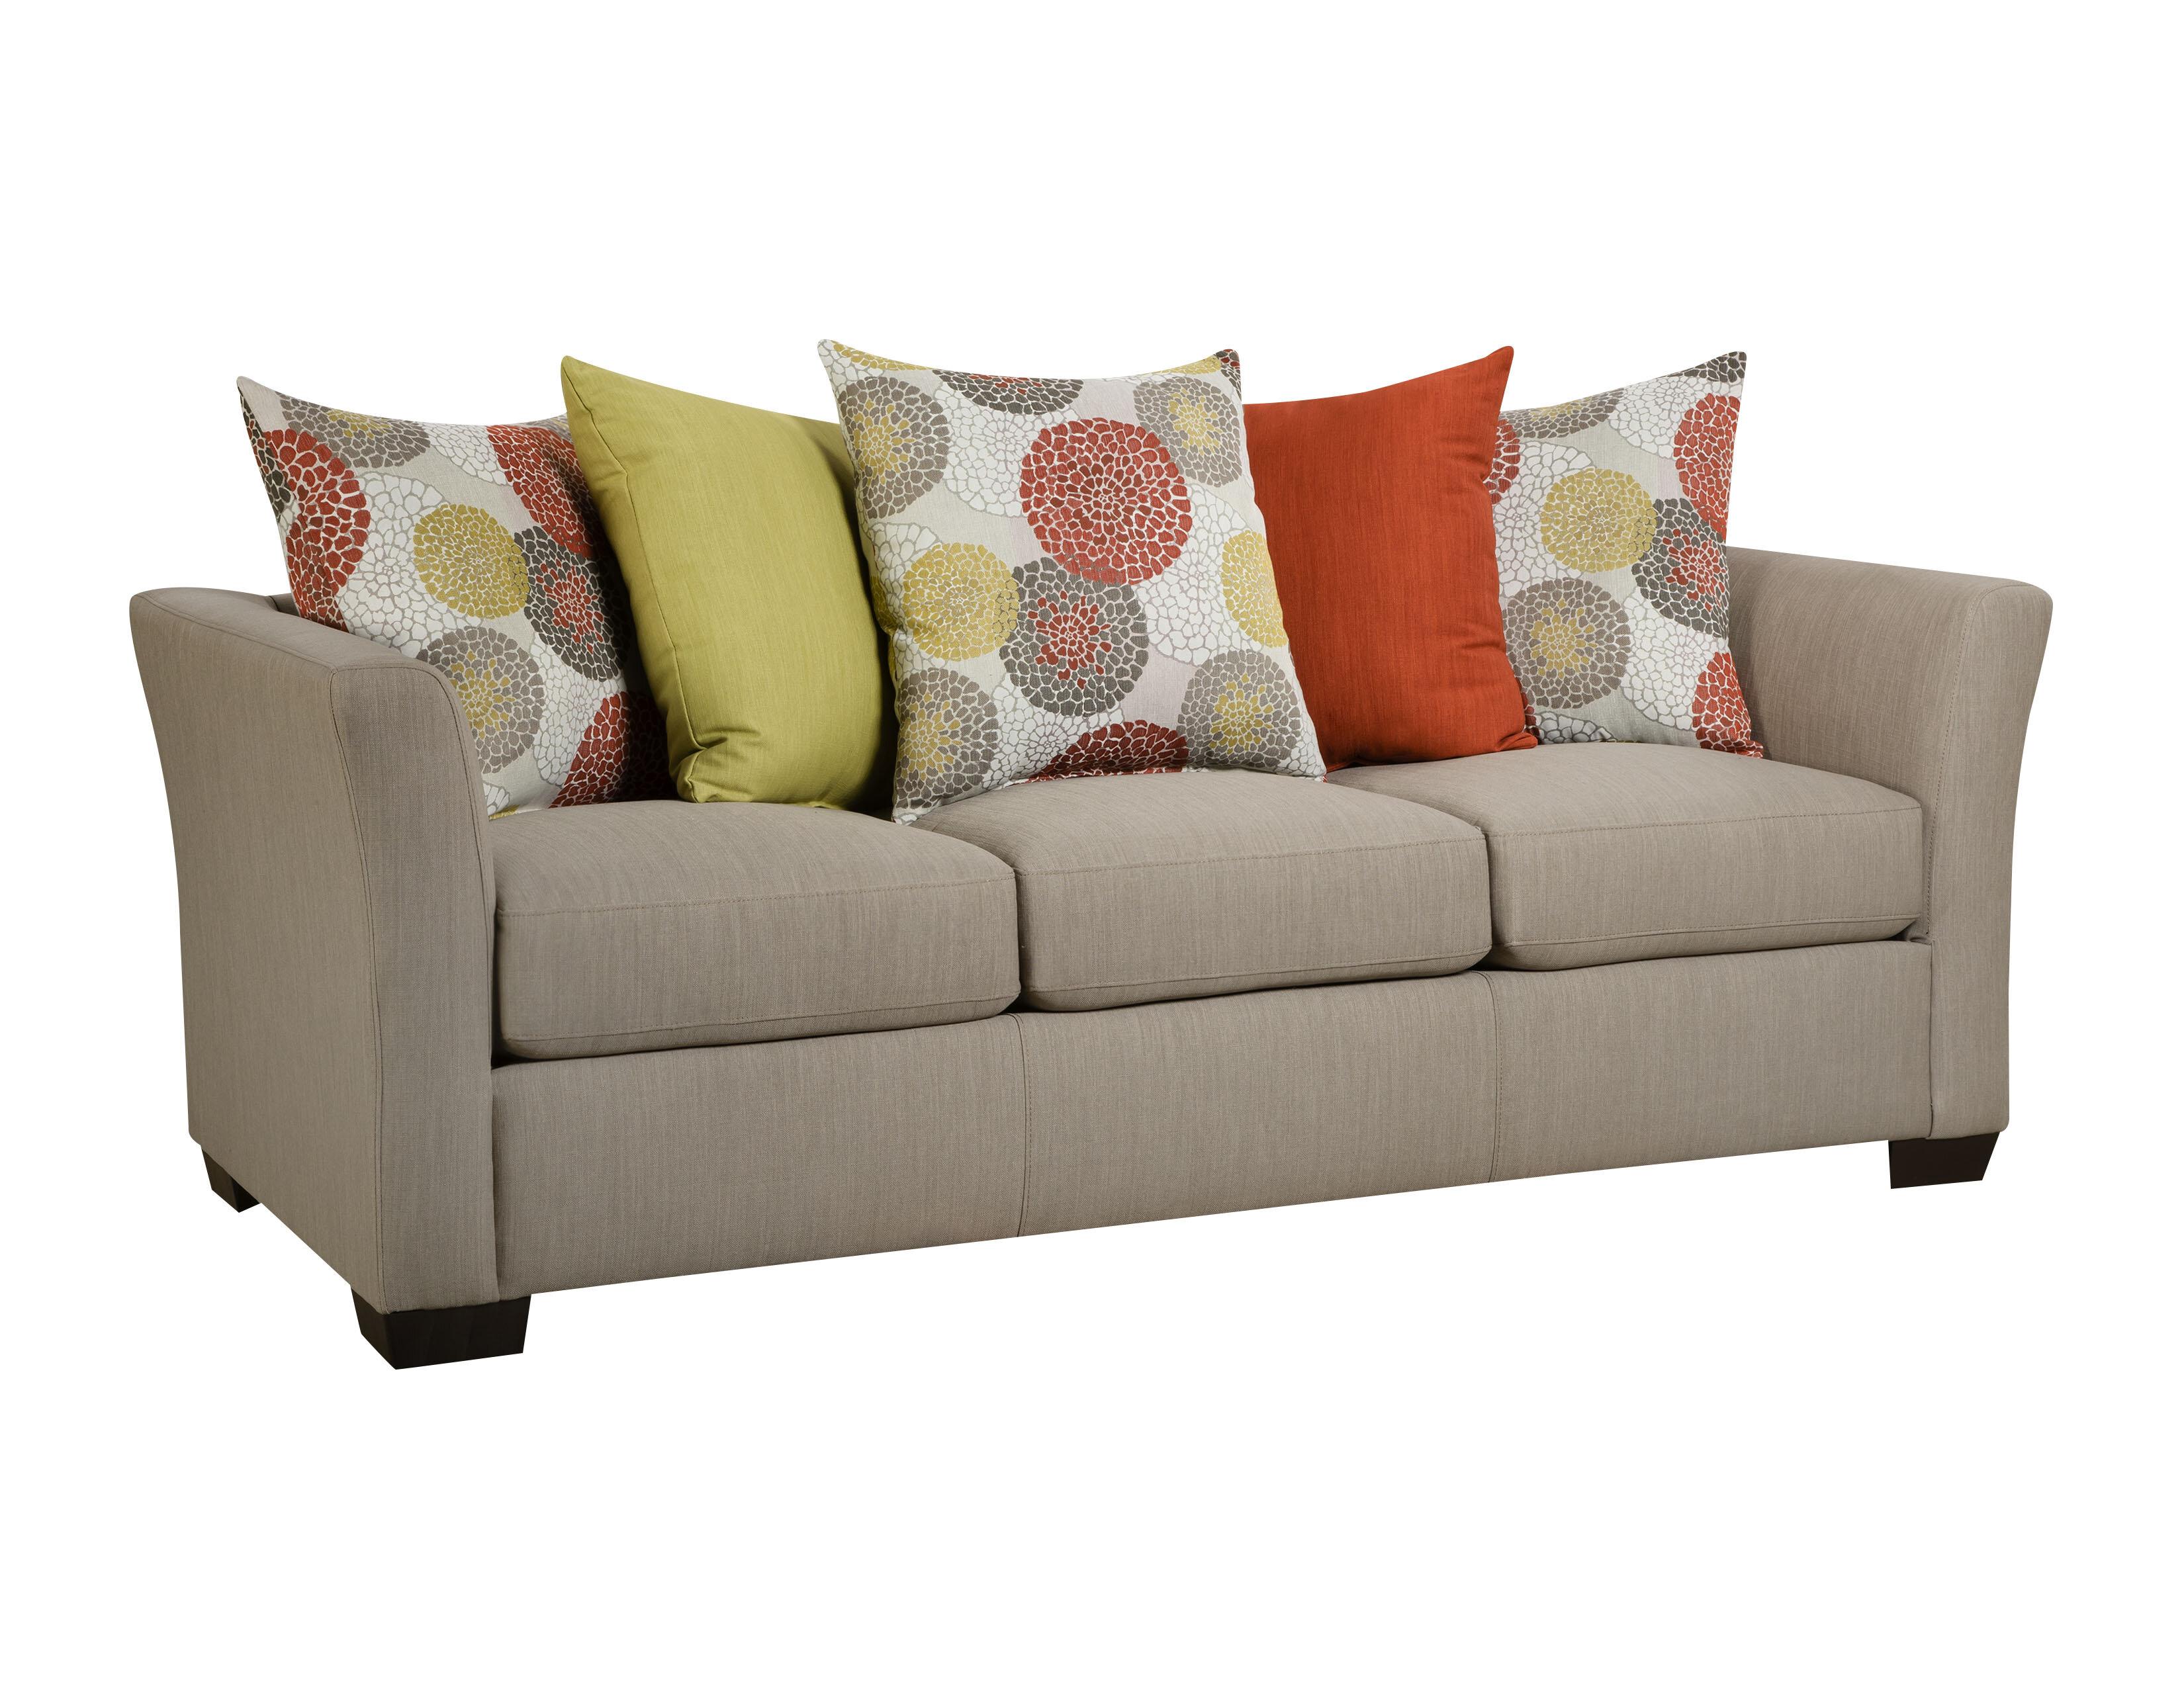 Simmons Upholstery Sleeper Sofa Www Gradschoolfairs Com